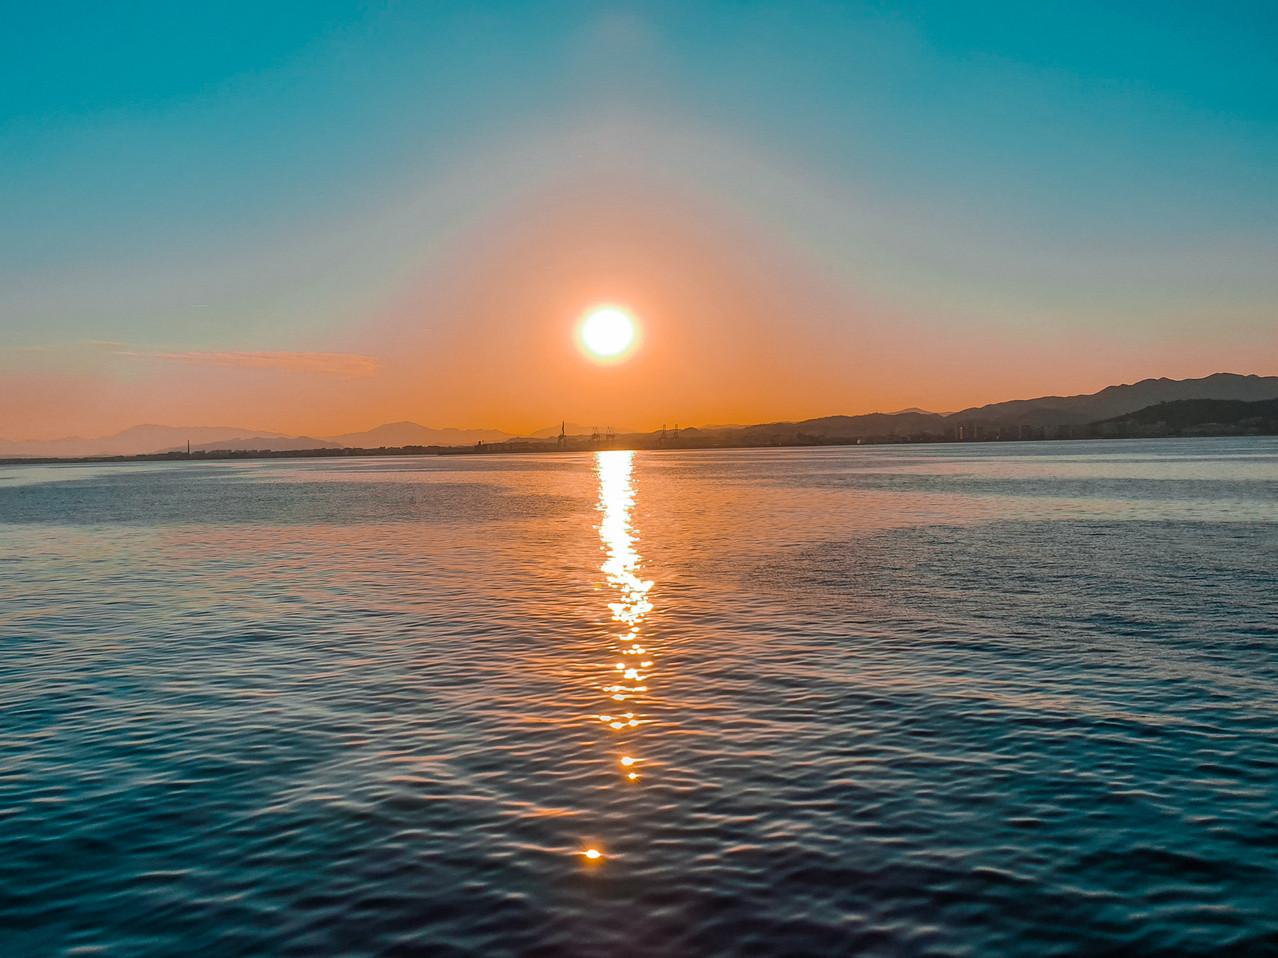 Sonnenuntergang / Sunset Malaga - Olivia Libi